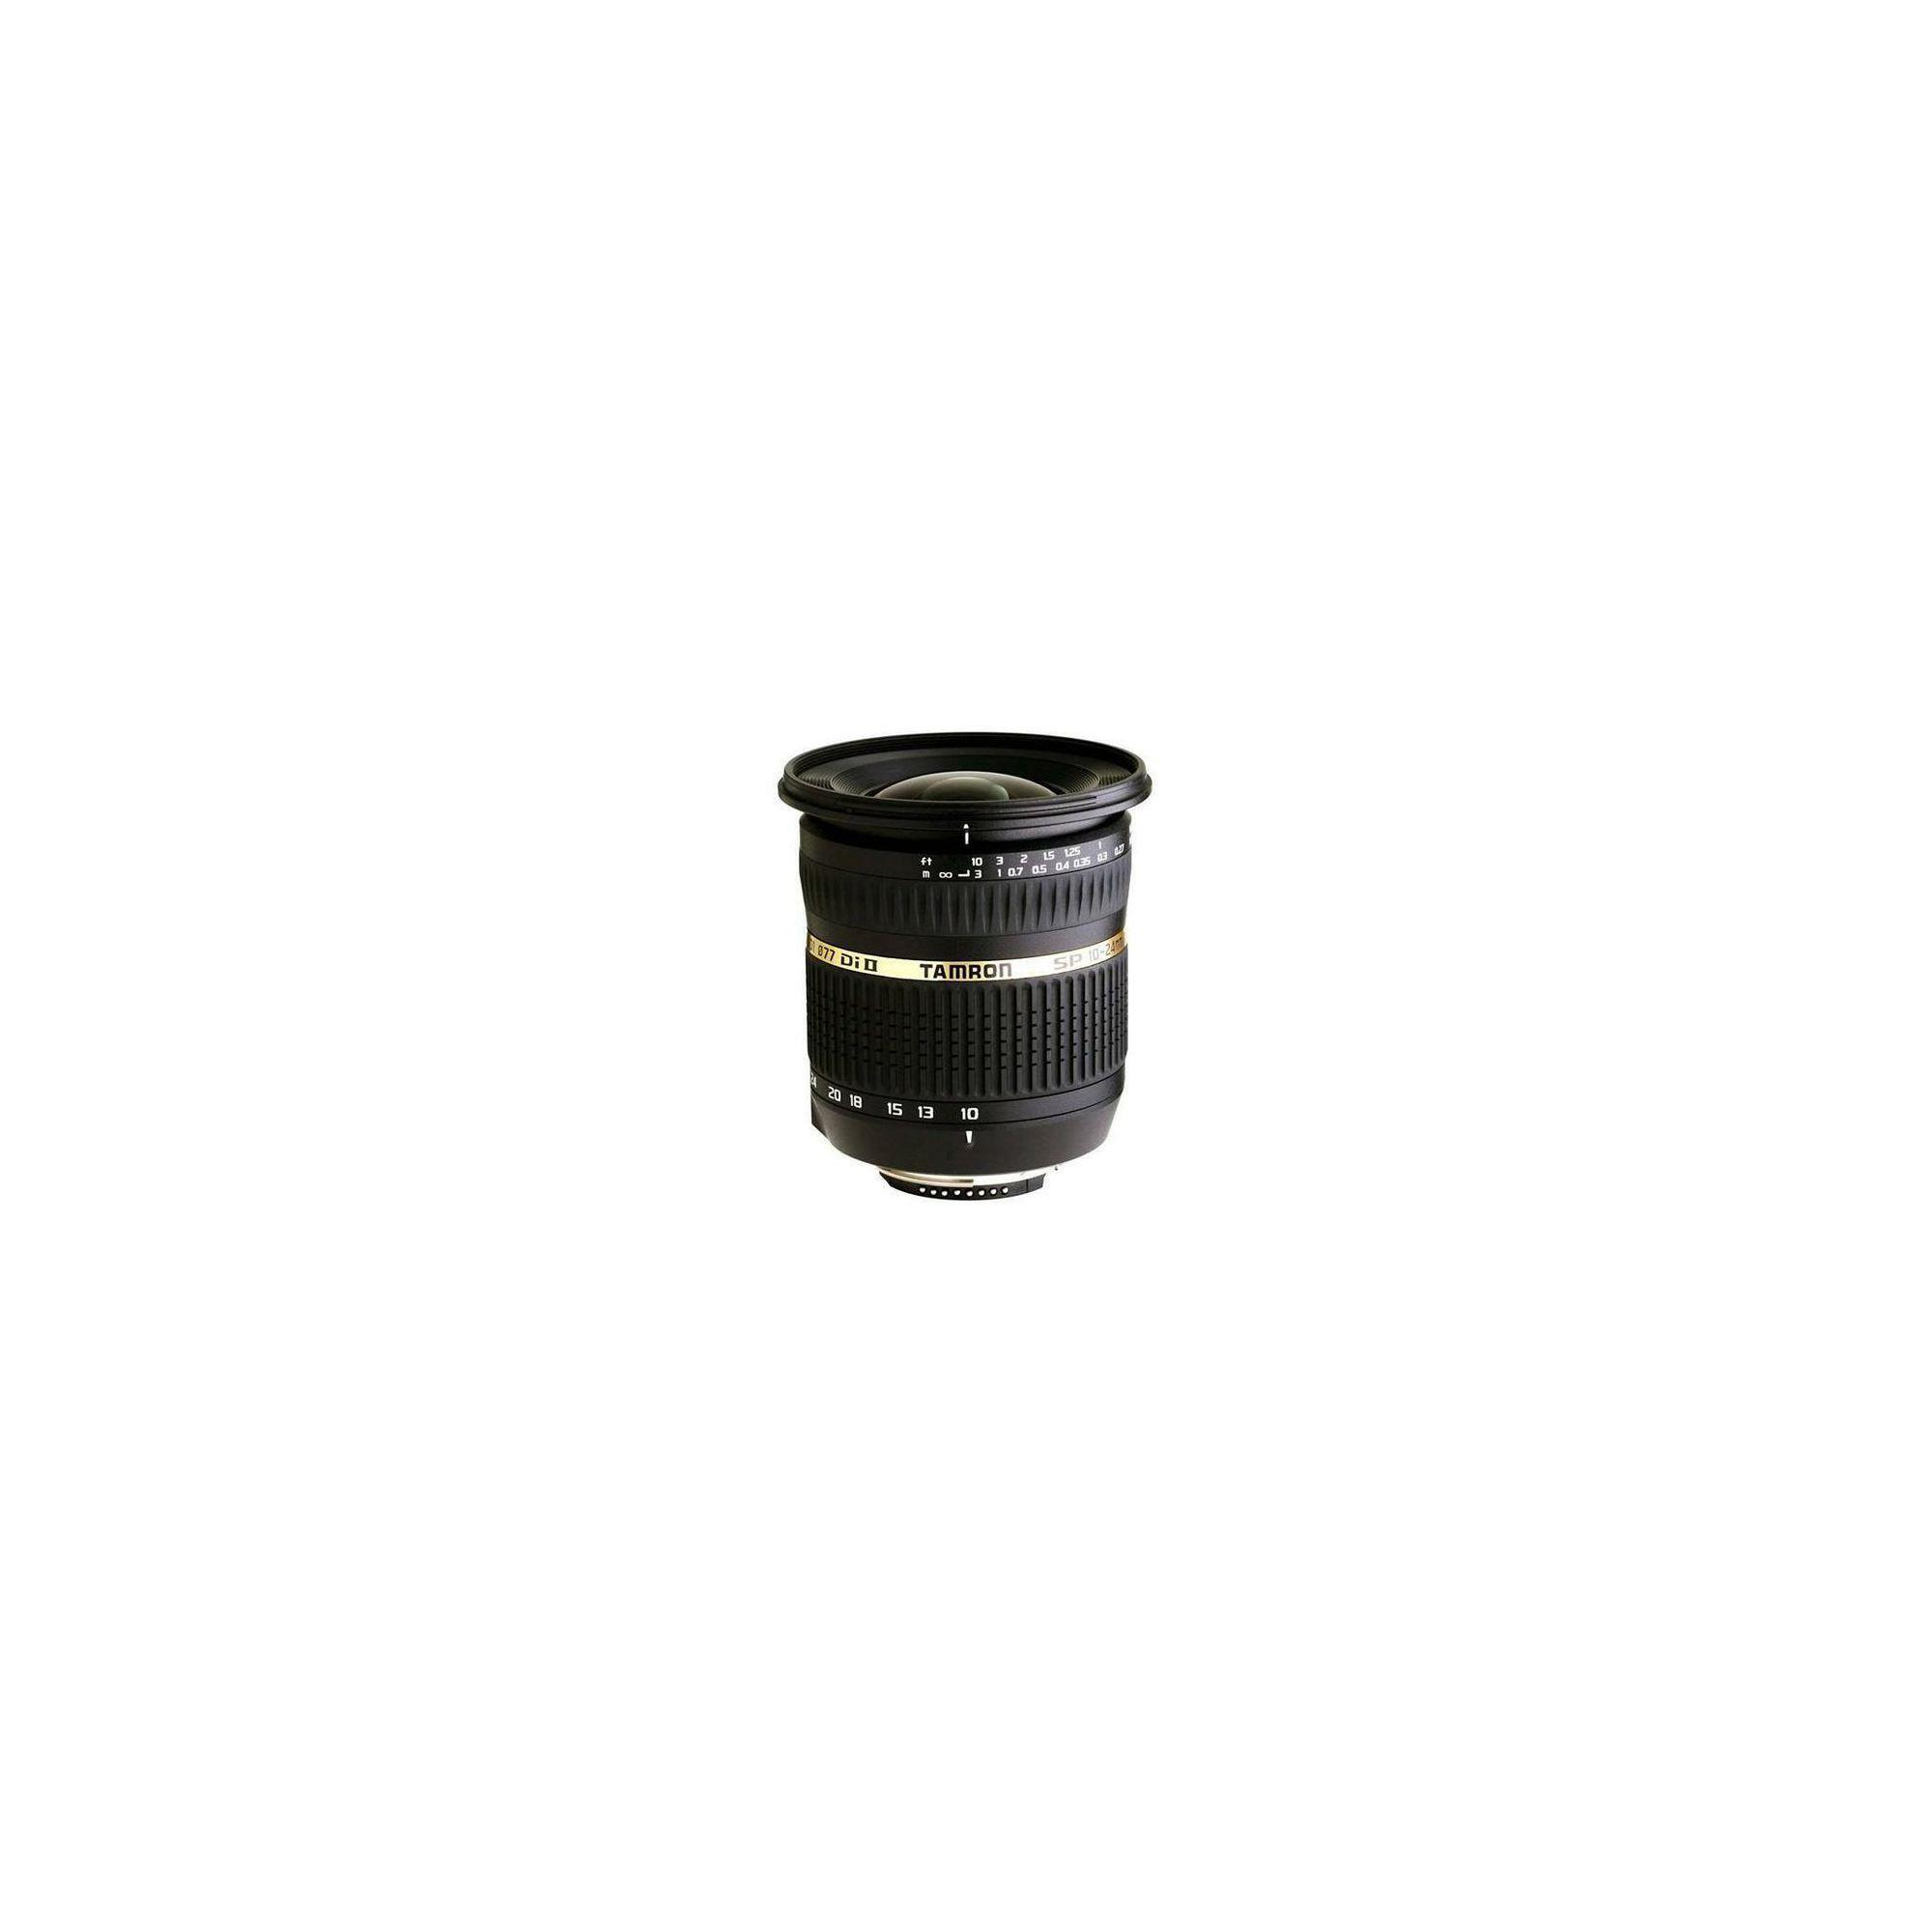 SP AF 10-24 mm f/3.5-4.5 Di II LD Aspherical (IF) Lens at Tesco Direct